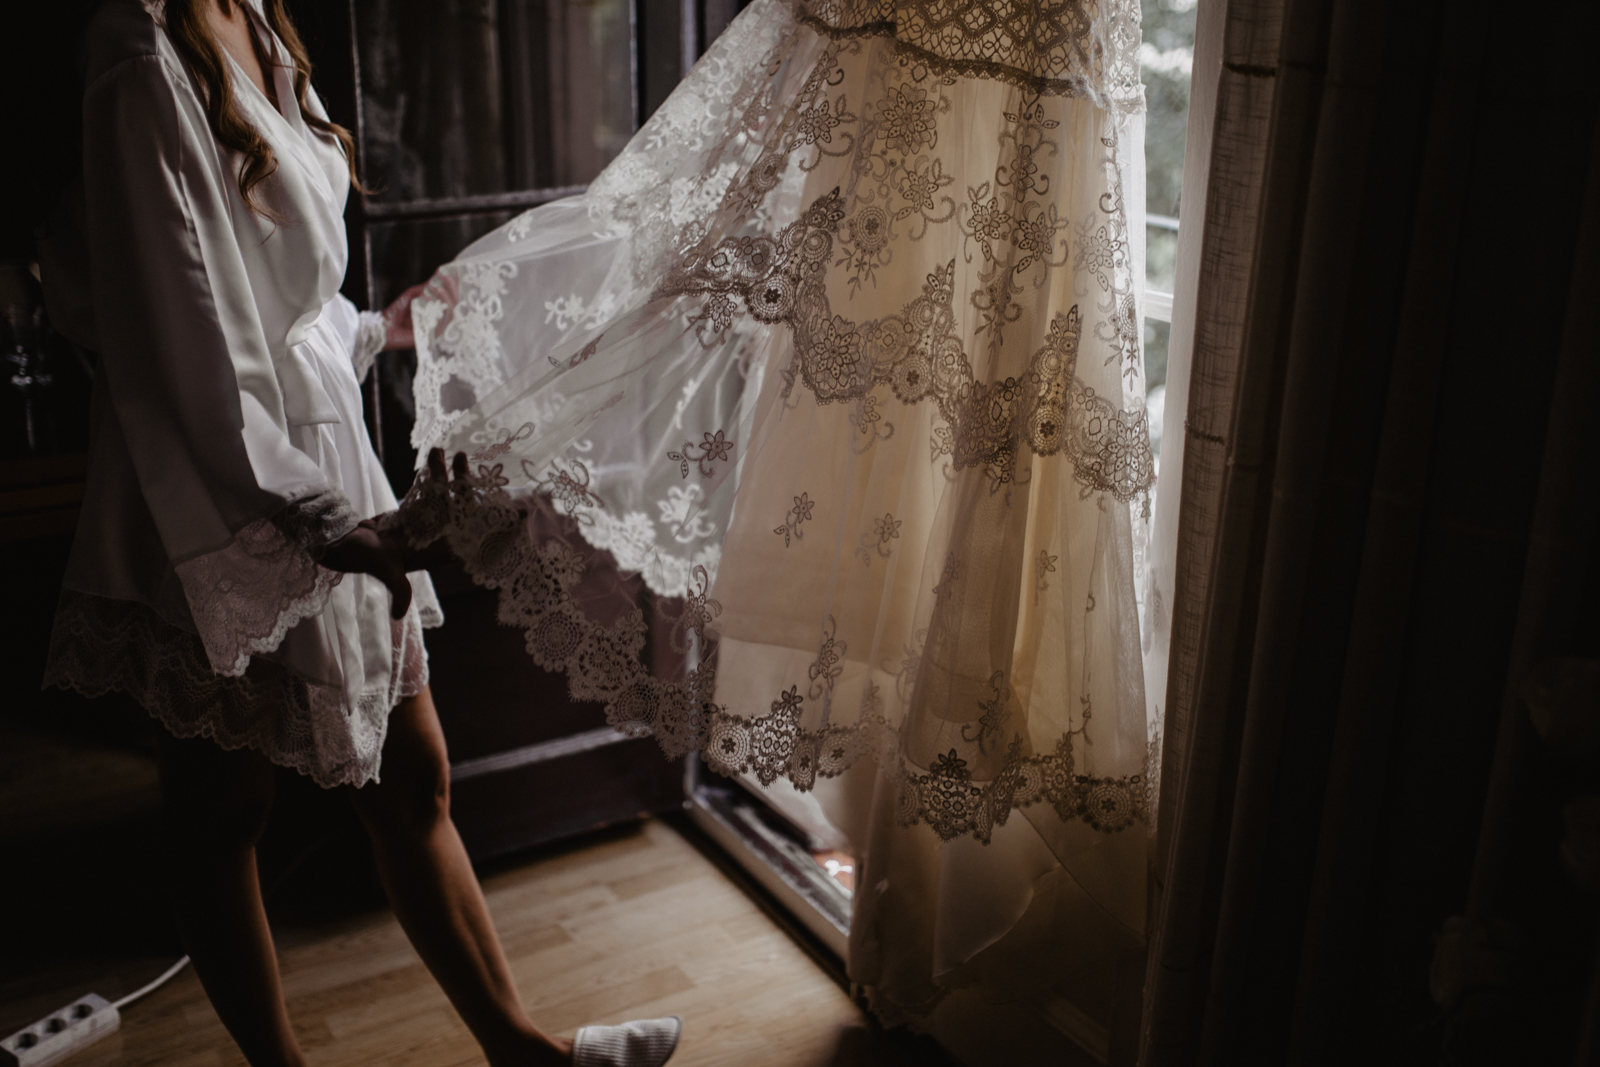 thenortherngirlphotography_photography_thenortherngirl_rebeccascabros_wedding_weddingphotography_weddingphotographer_barcelona_bodaenbarcelona_bodaenmaselmarti_bodarogeryvane-188.jpg